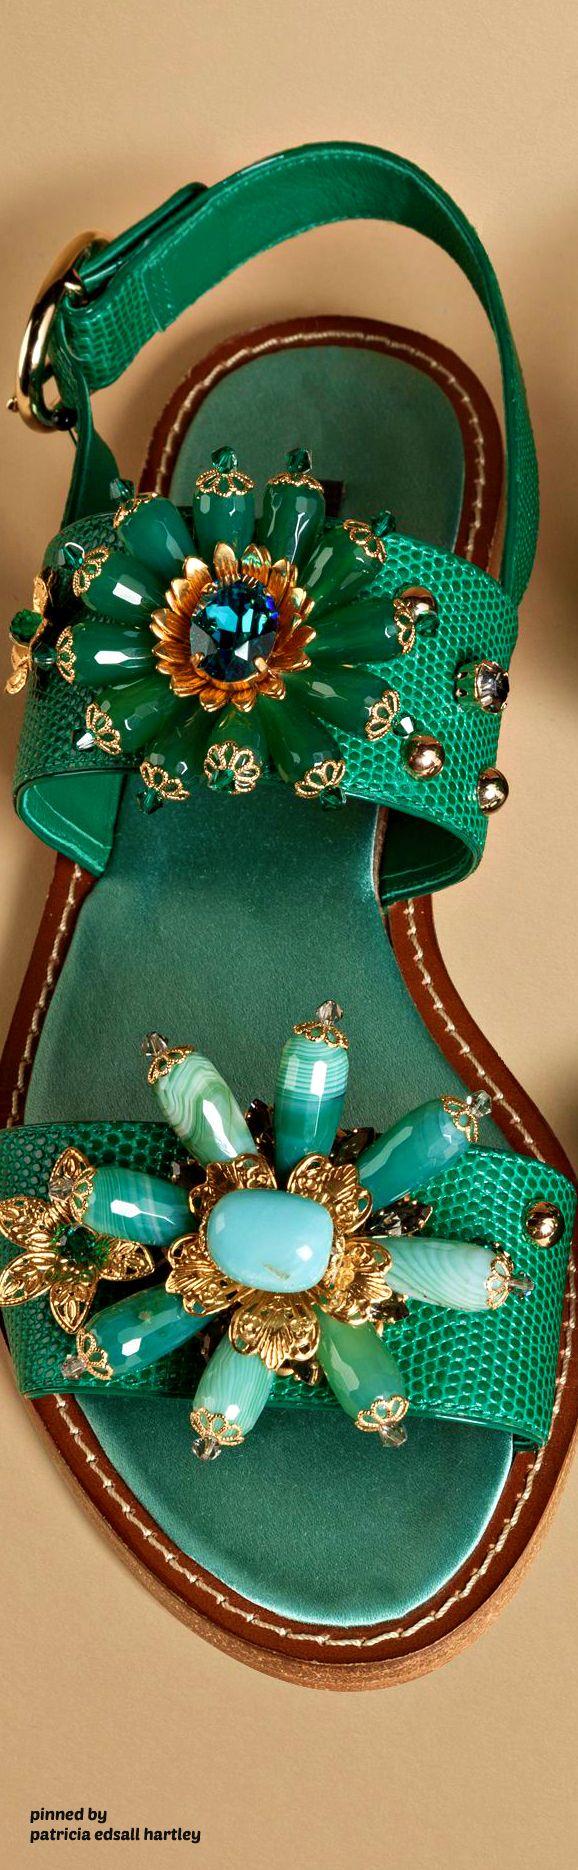 Glorious green candles - Dolce & Gabbana 2016